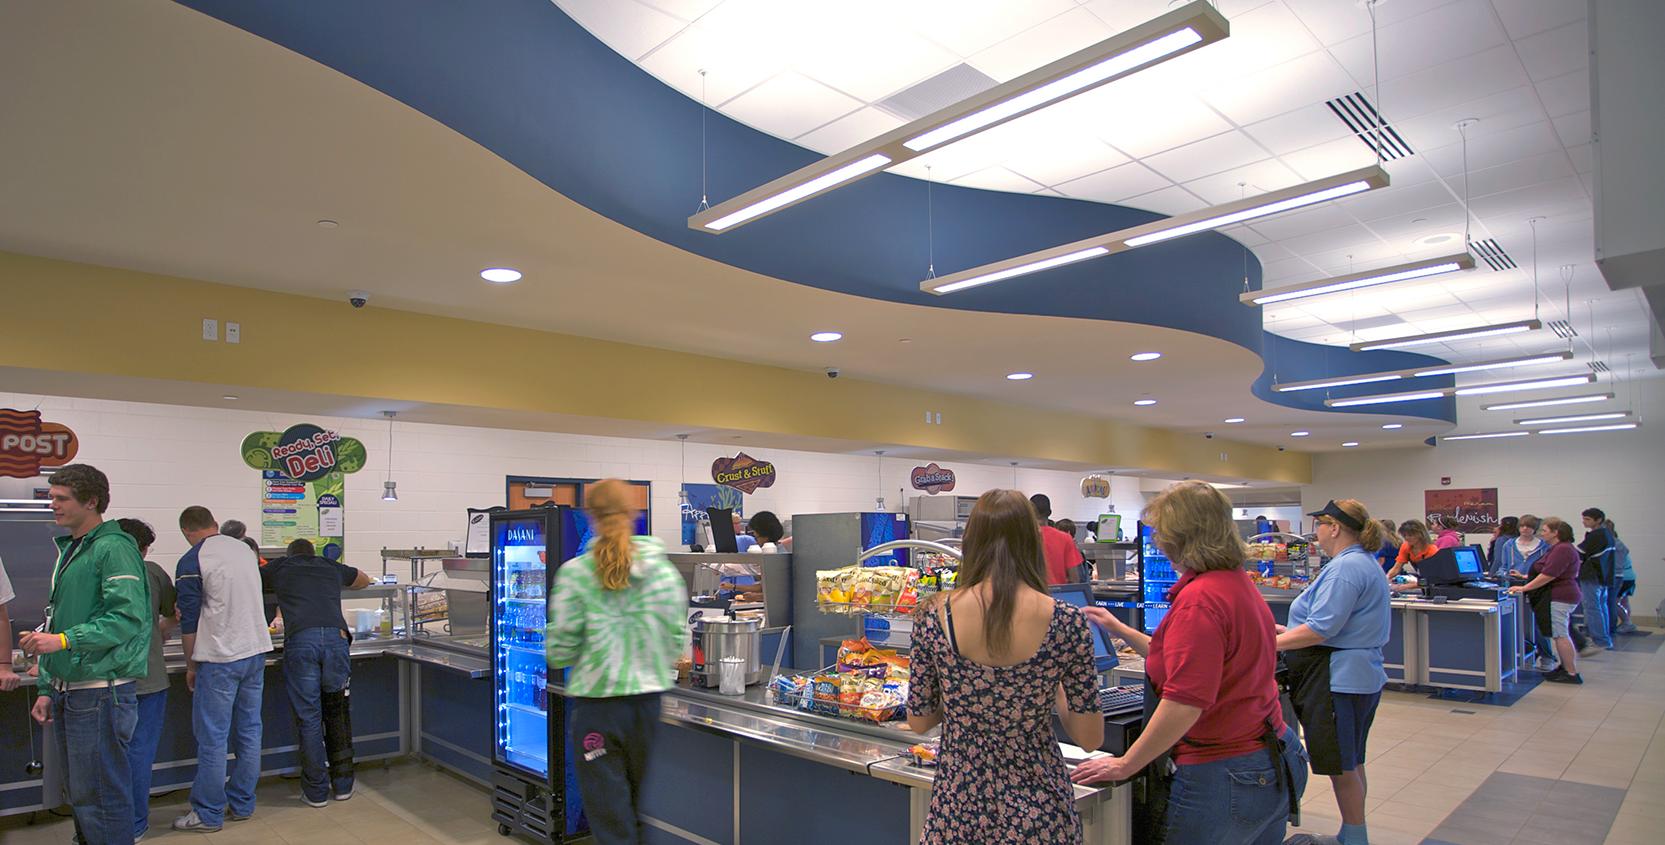 Portage-Central-HS-Cafeteria-2-1665x845